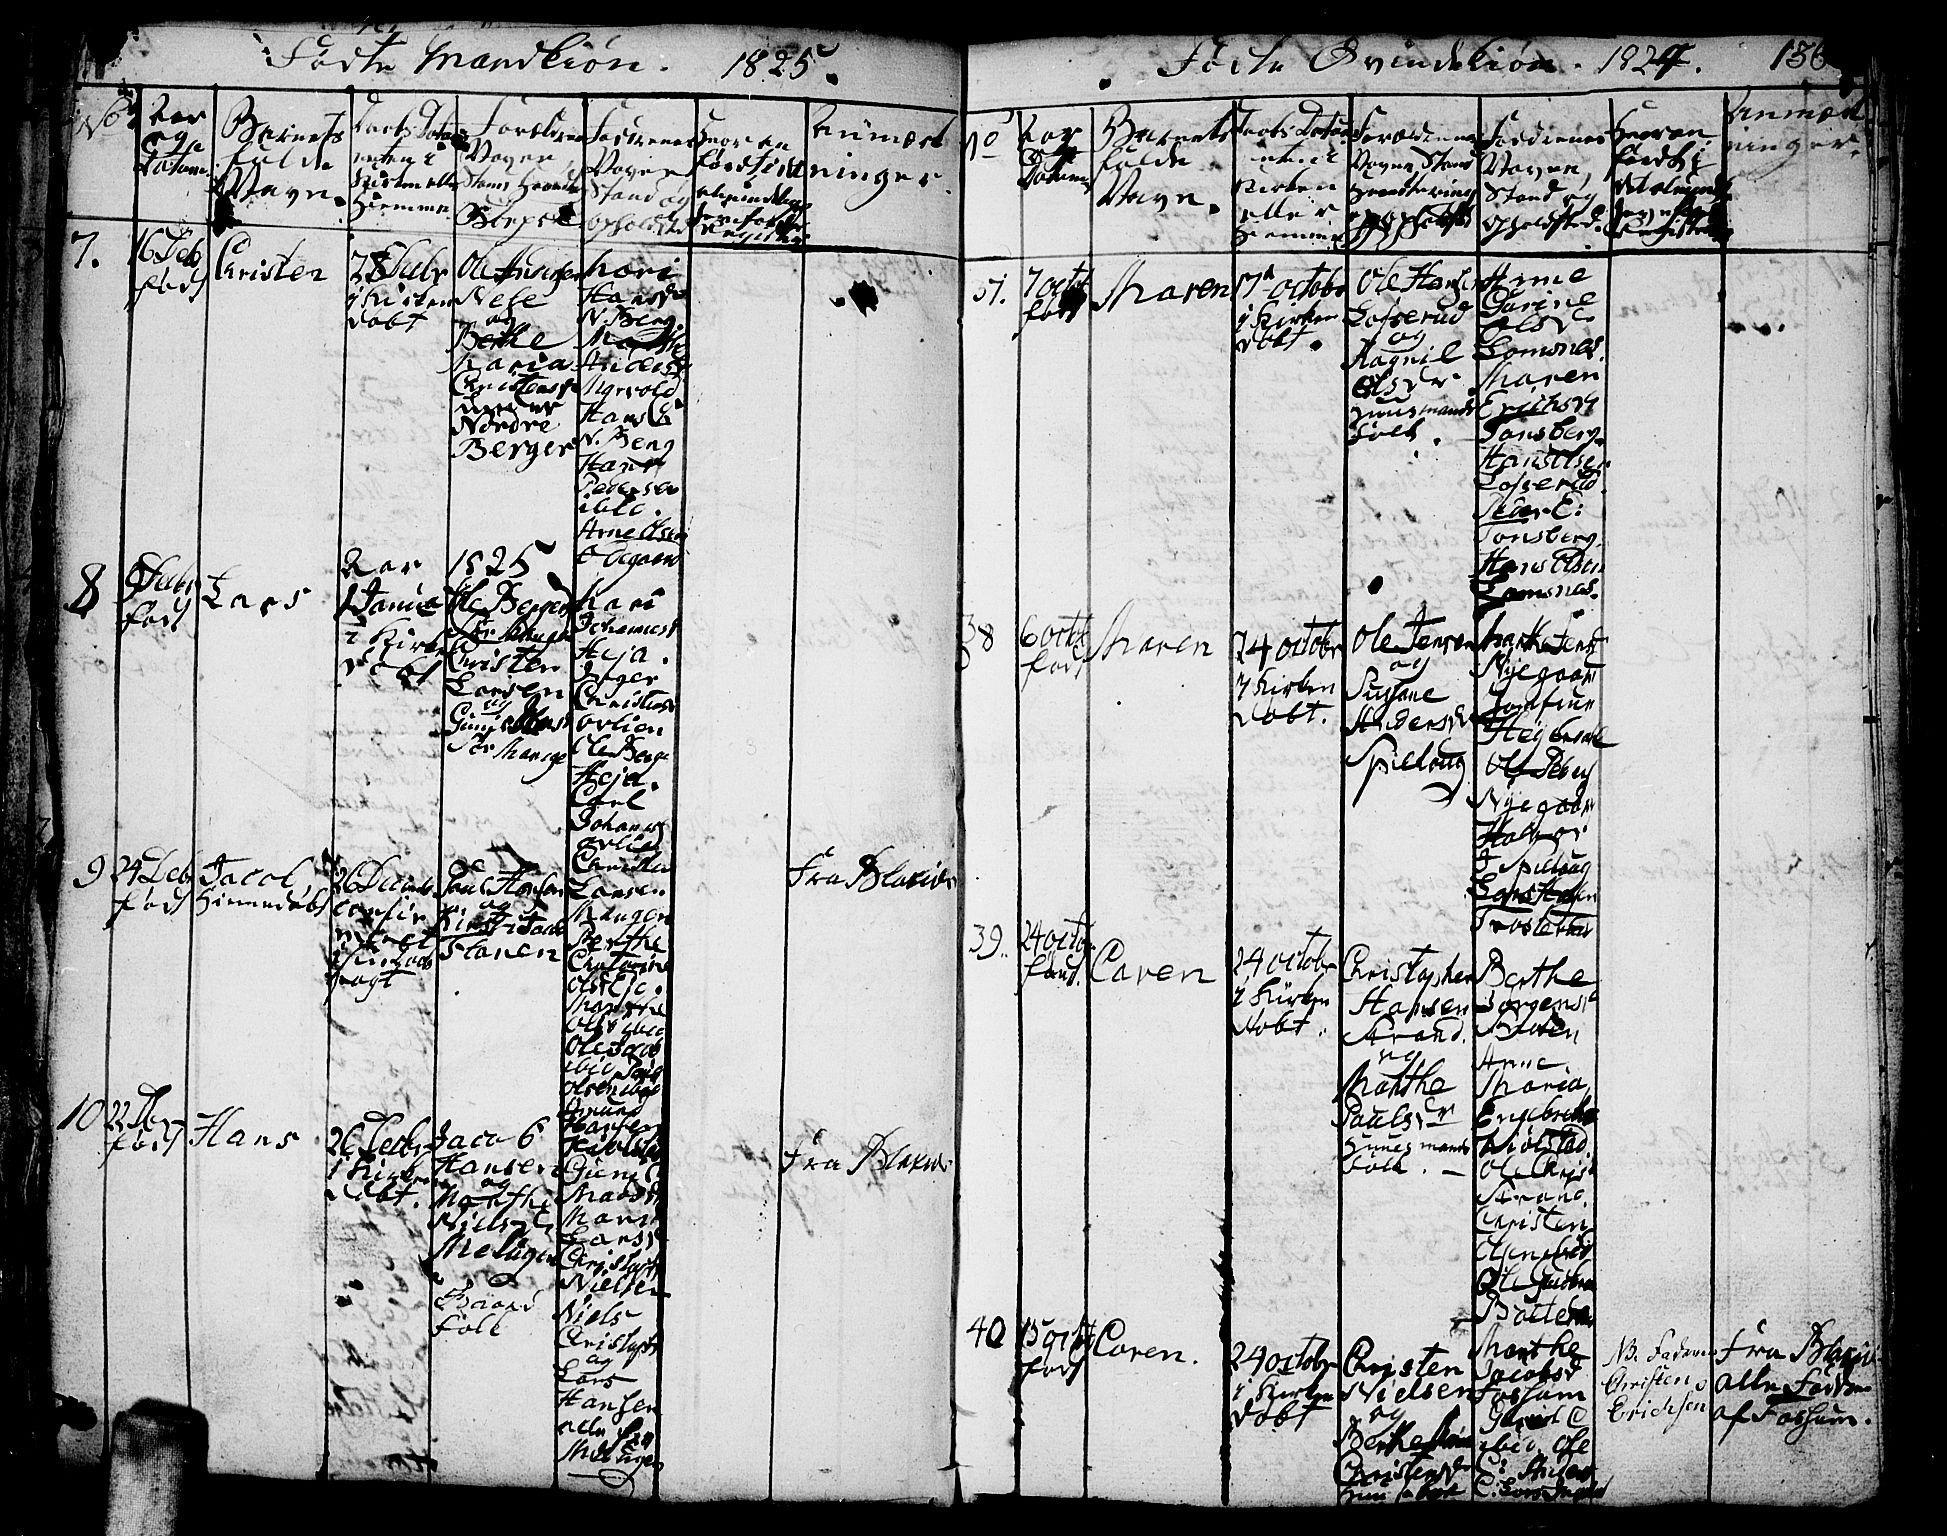 SAO, Aurskog prestekontor Kirkebøker, F/Fa/L0005: Ministerialbok nr. I 5, 1814-1829, s. 136